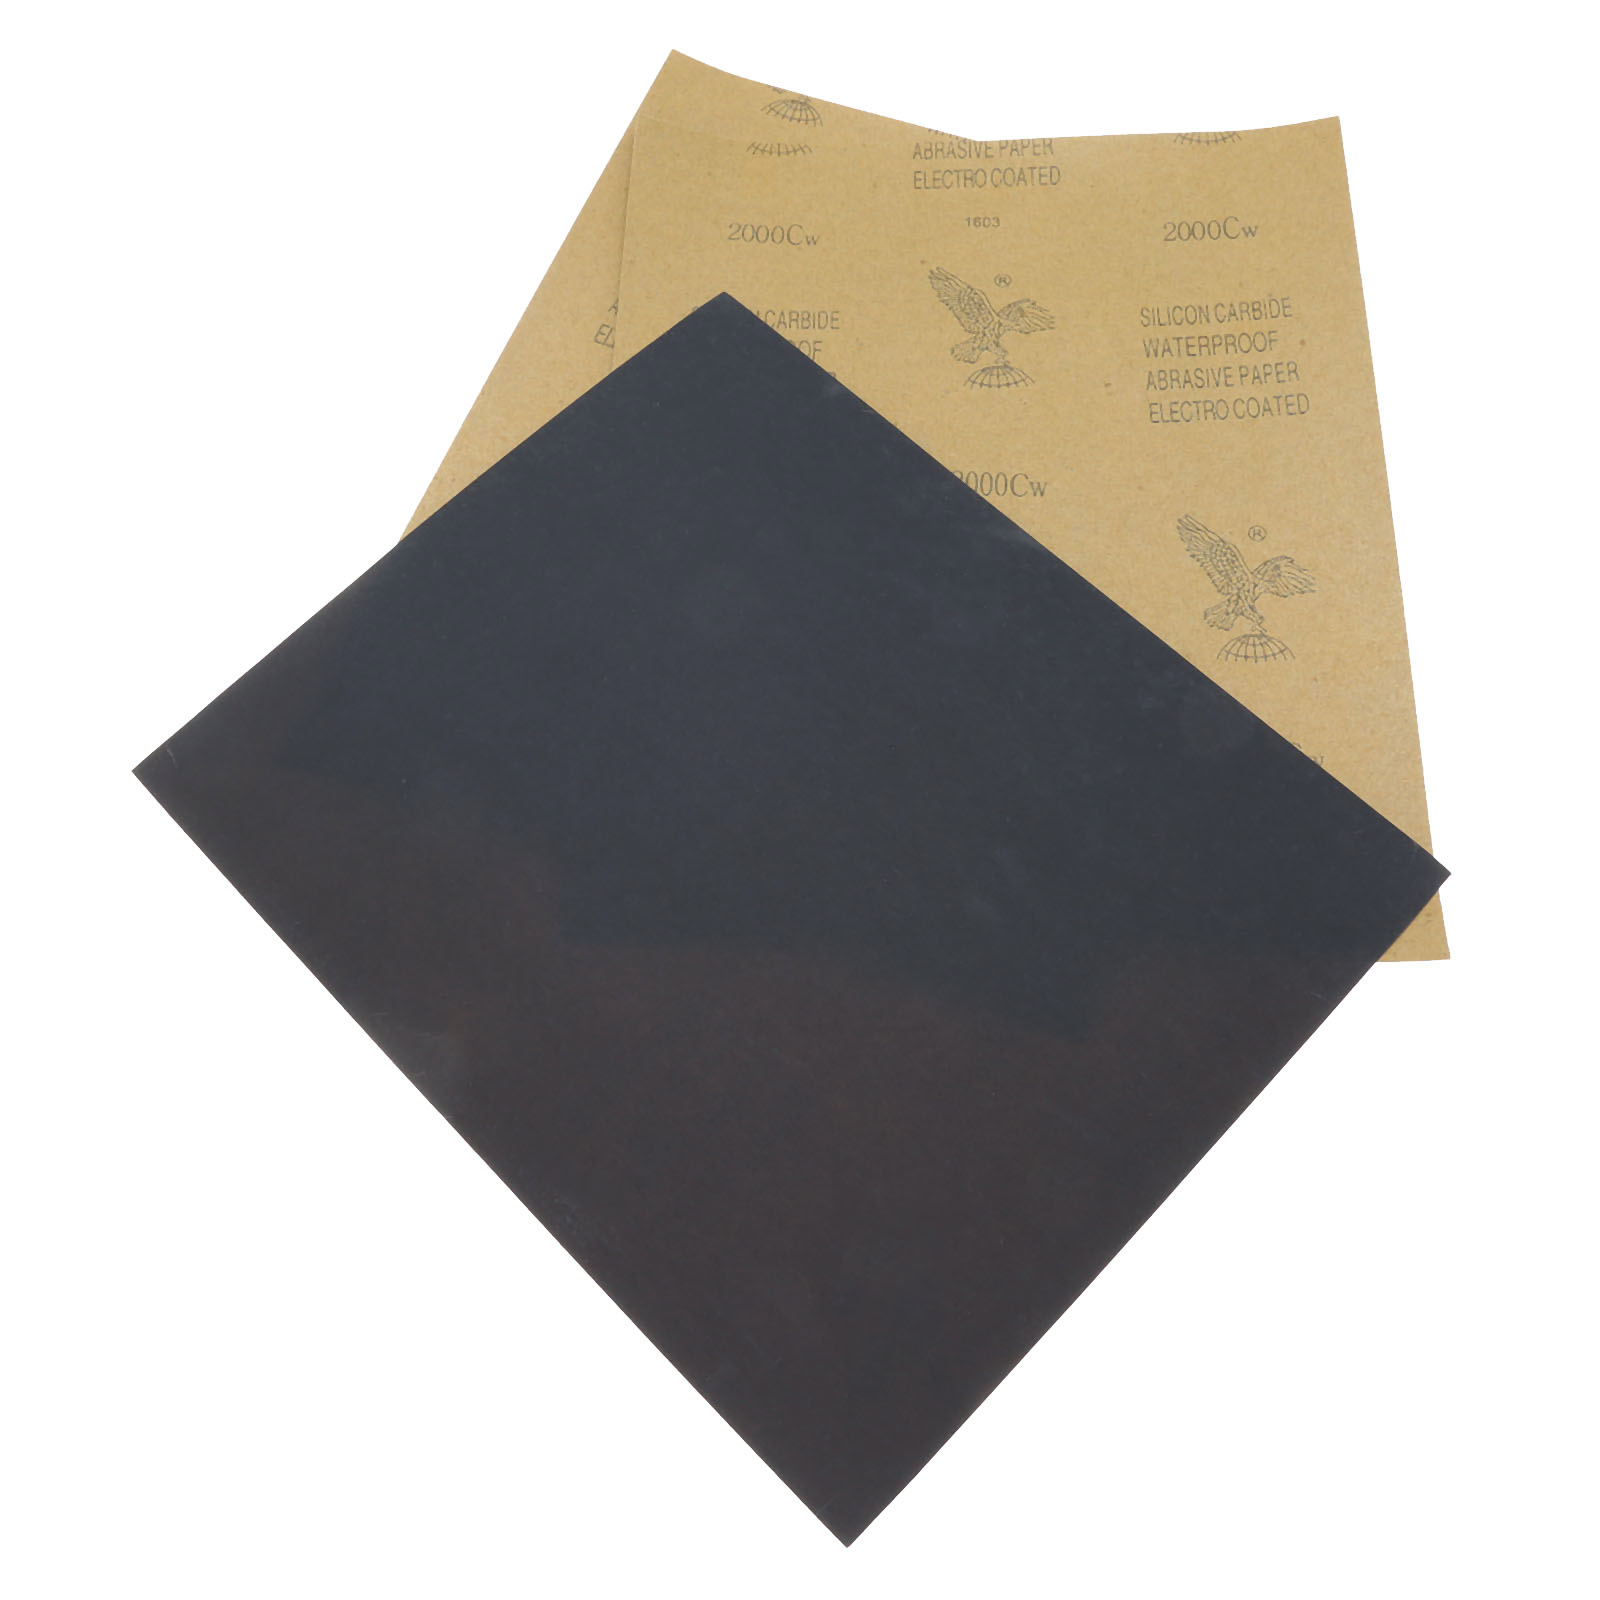 Dophee 3 Sheet Sandpaper Waterproof Abrasive Paper Sand Paper Silicone Carbide Polishing Grinding Wet/dry Tool 2000 Grit 28*23cm